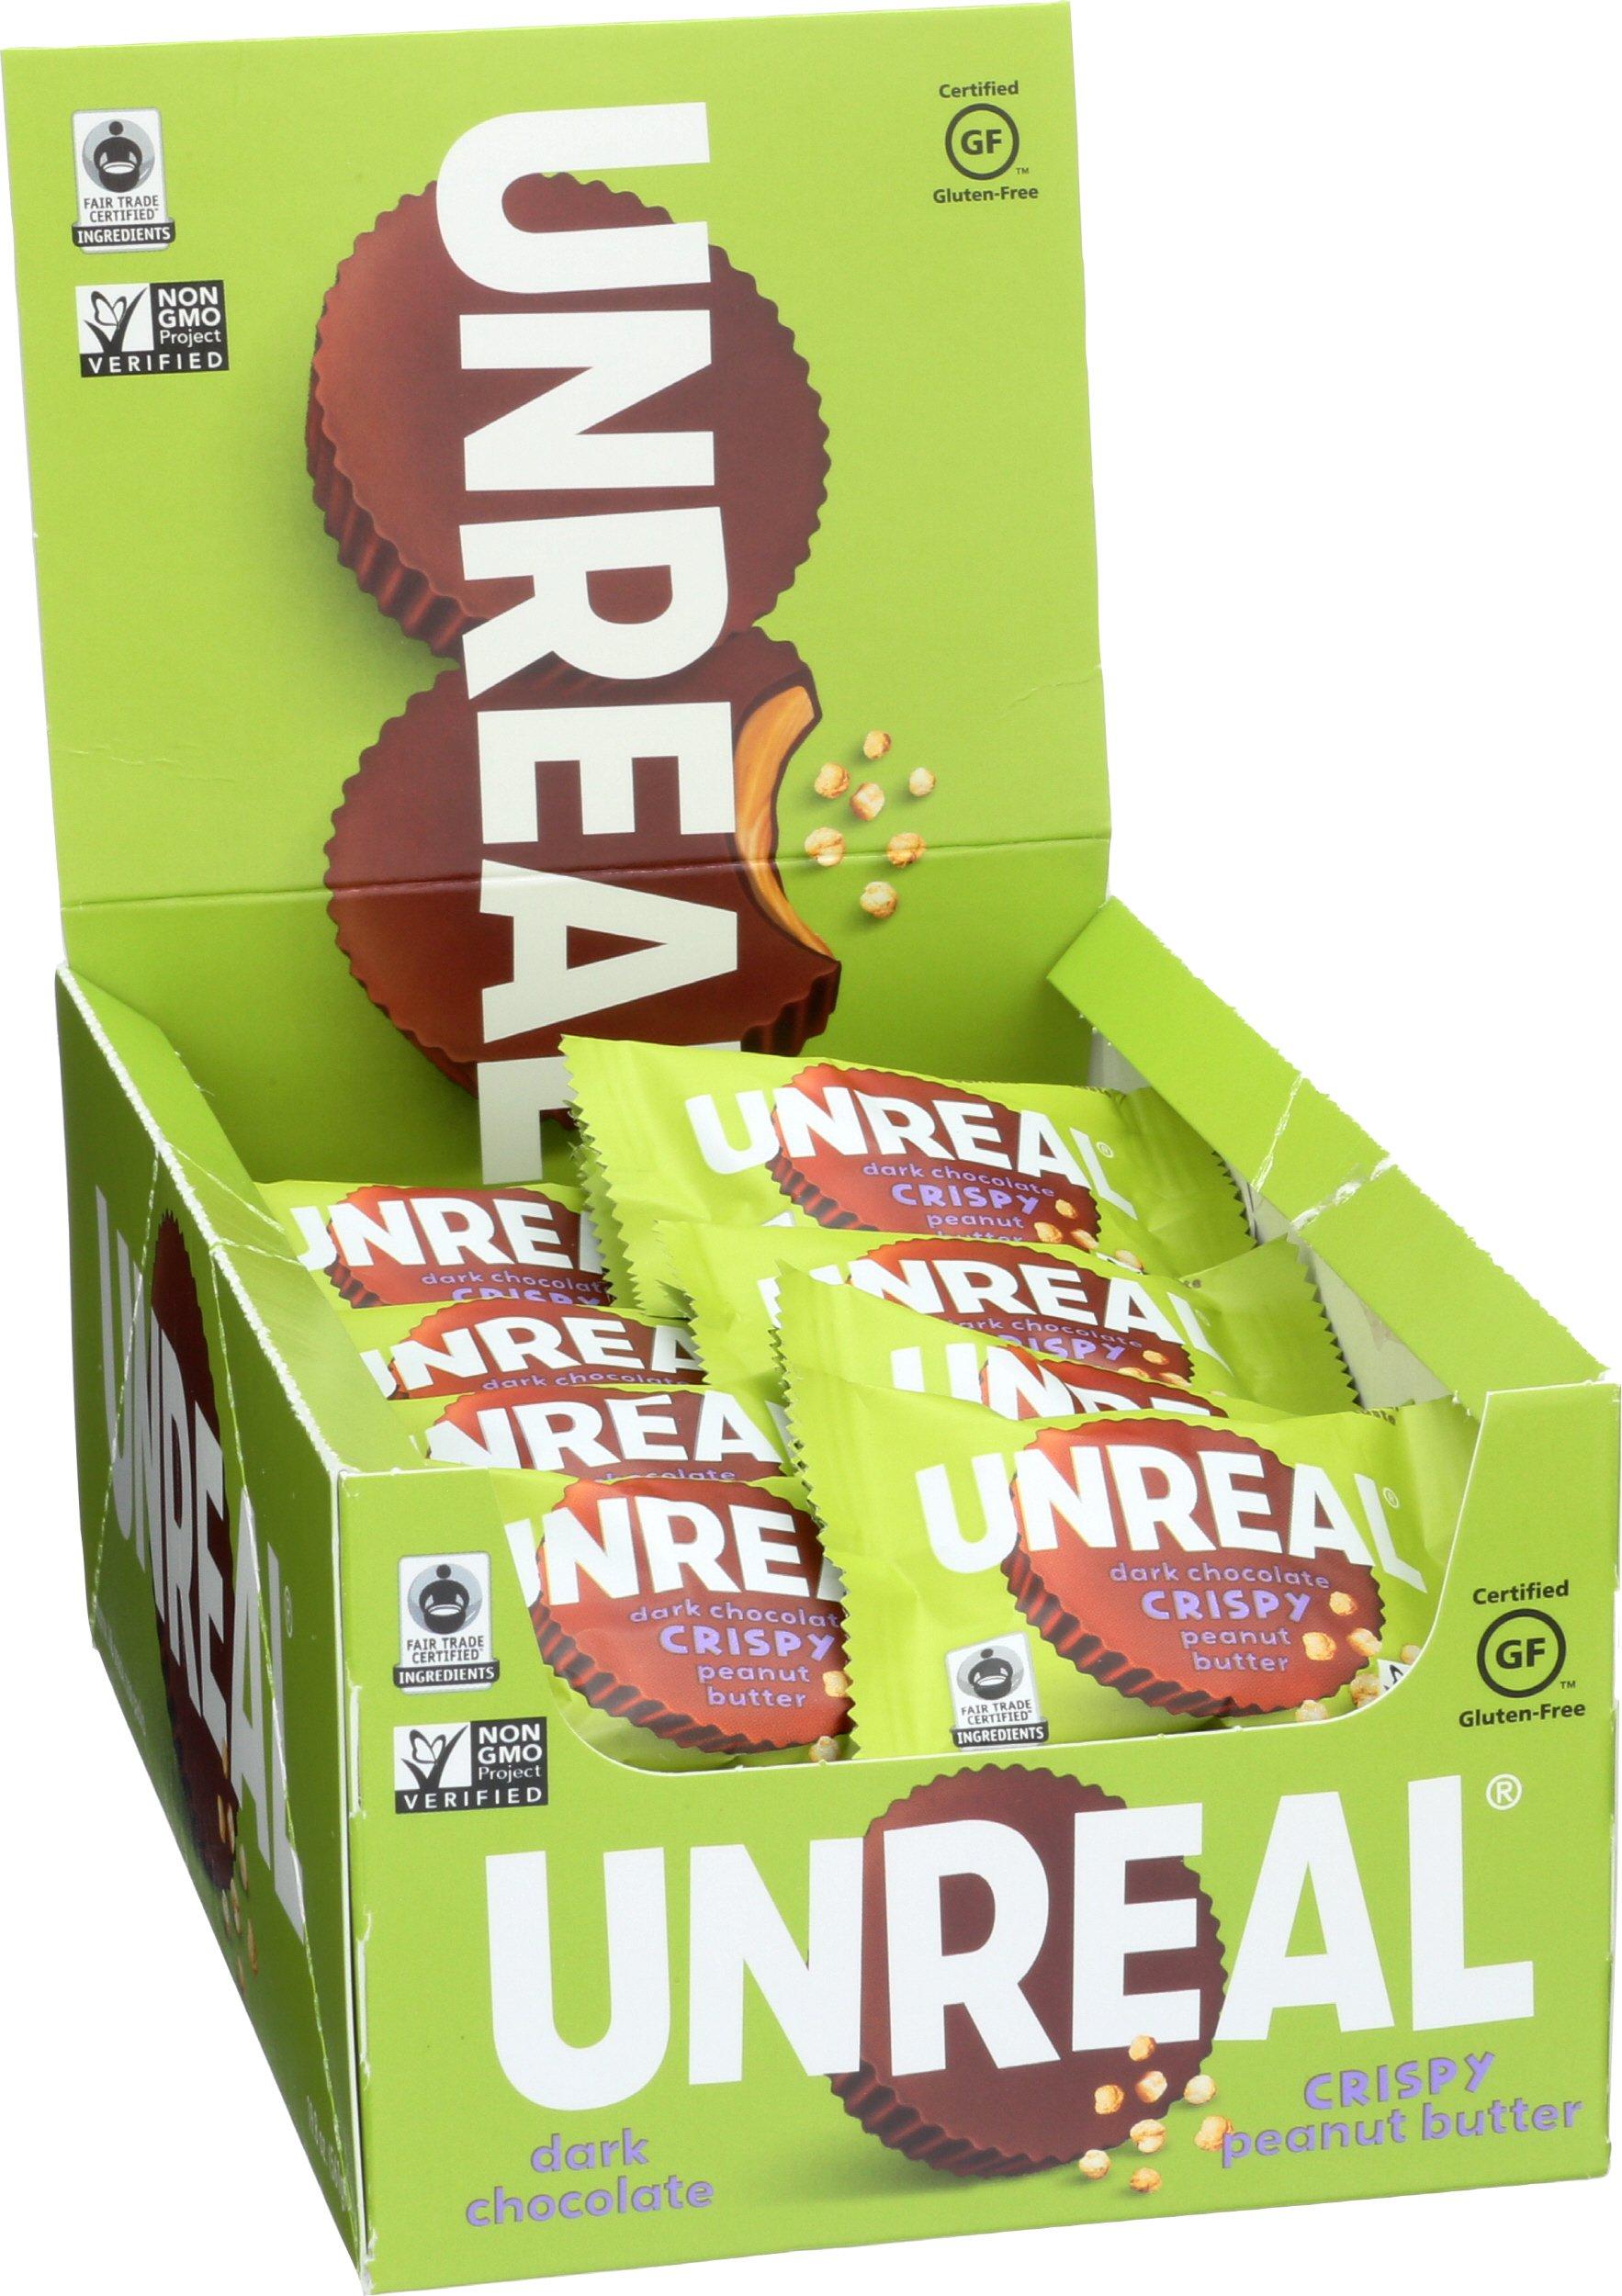 UNREAL Dark Chocolate Crispy Quinoa Peanut Butter Cups, 40 Count by UNREAL